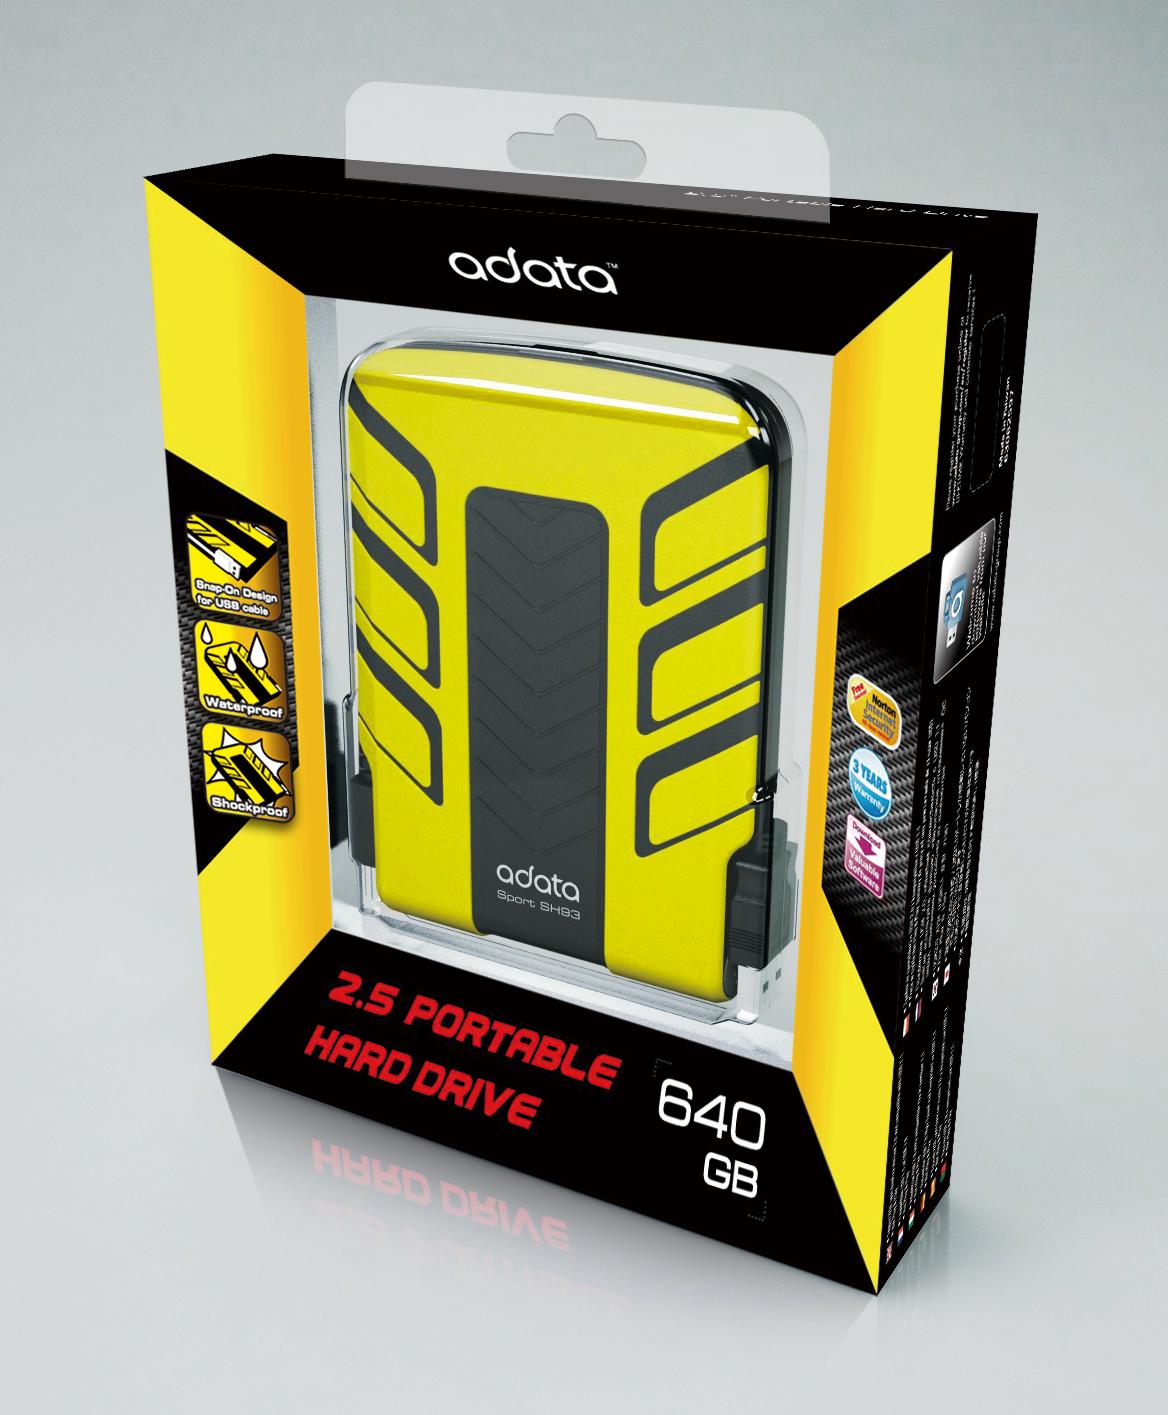 A-DATA SH93 waterproof & shock-resistant portable hard-drive